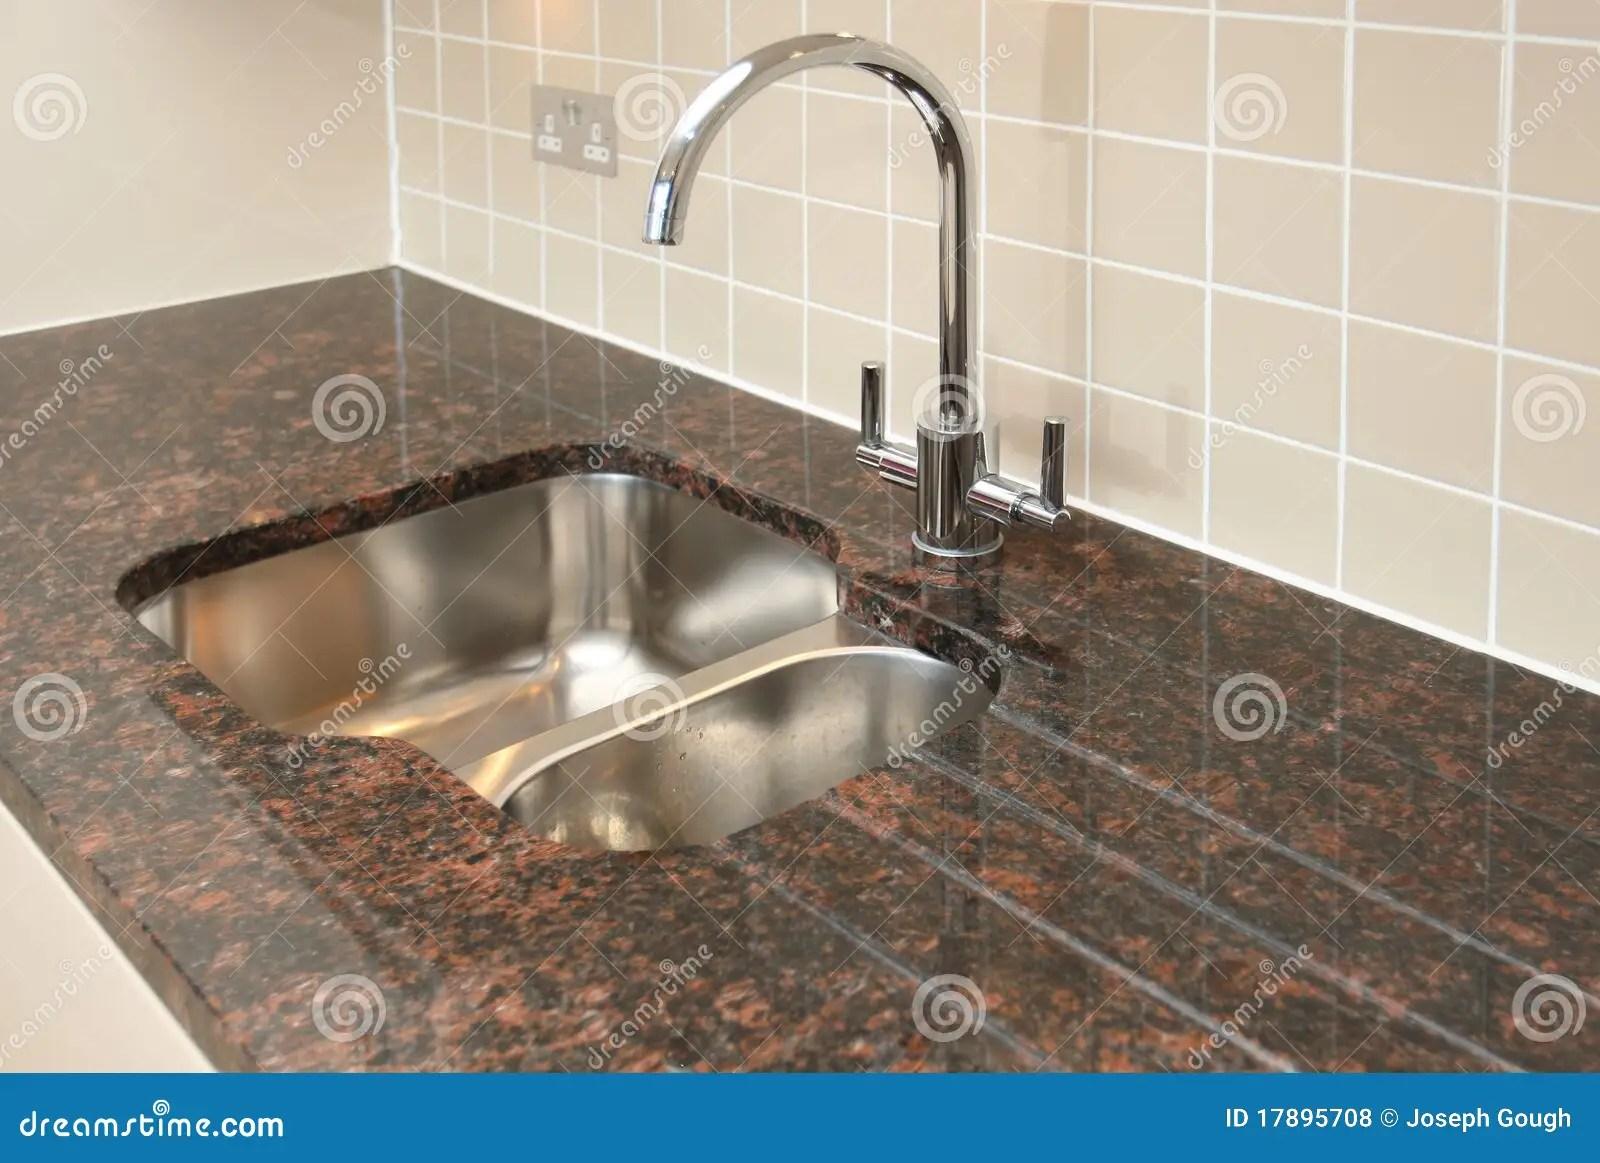 royalty free stock photos kitchen sink granite worktop image granite kitchen sinks Kitchen Sink with Granite Worktop